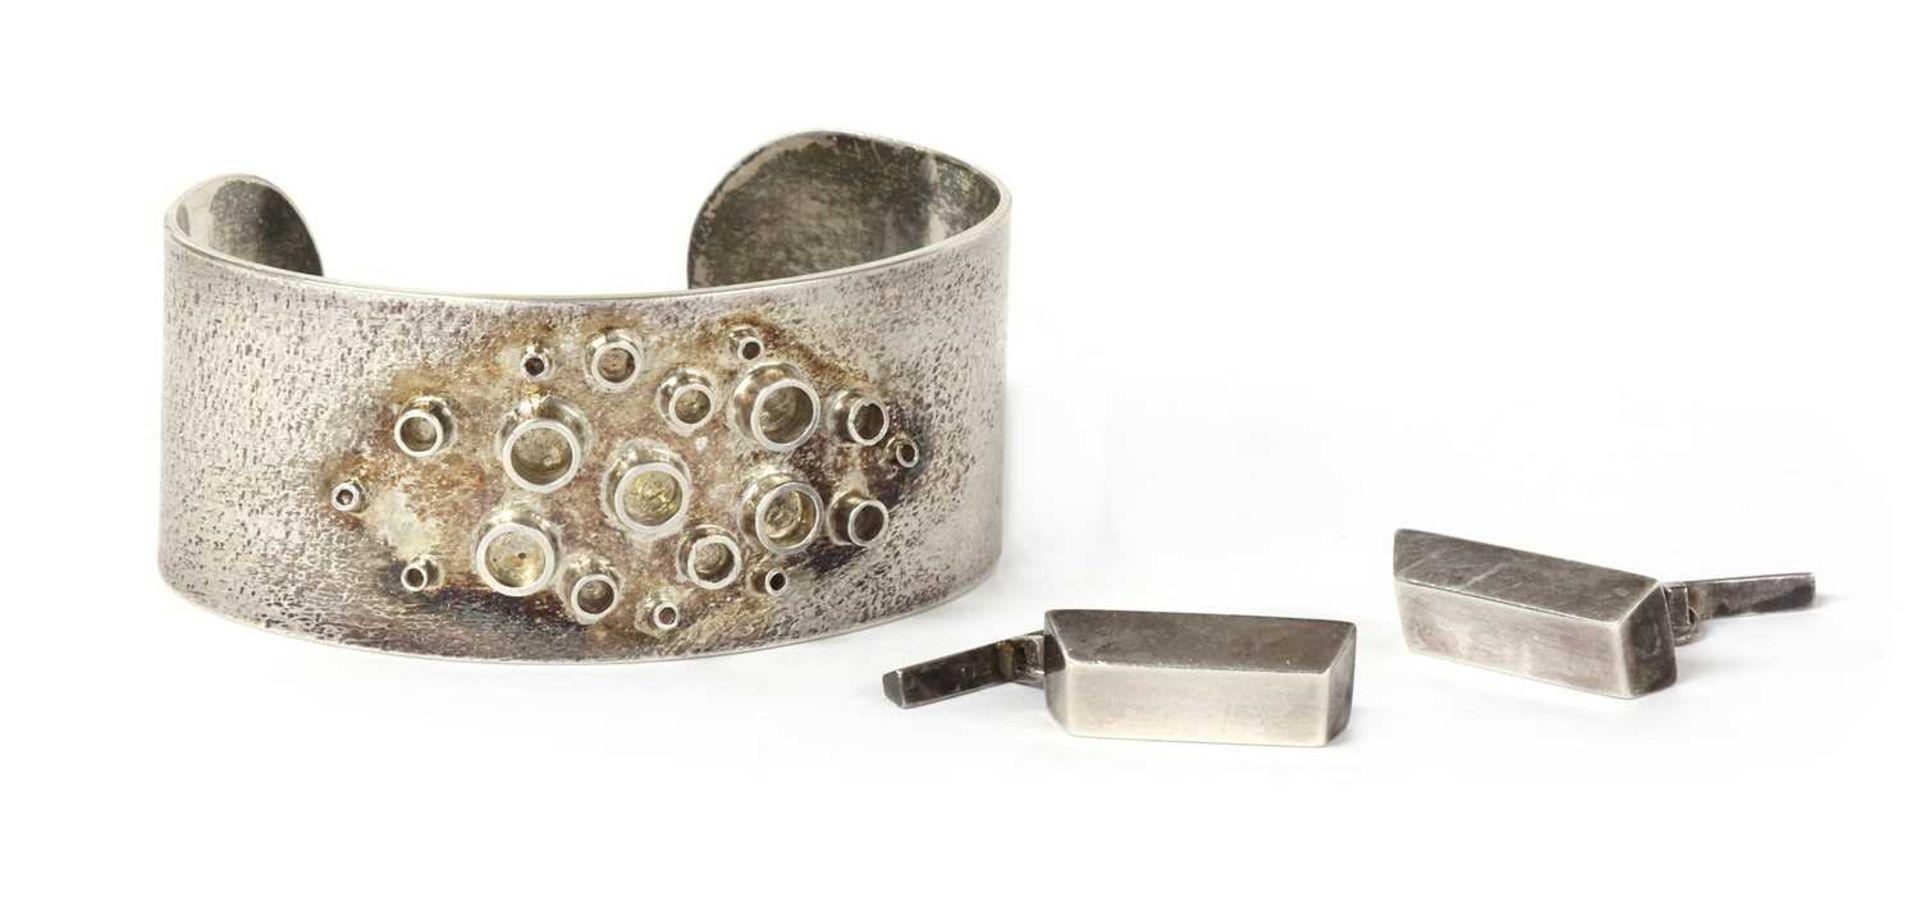 A handmade sterling silver torque bangle,